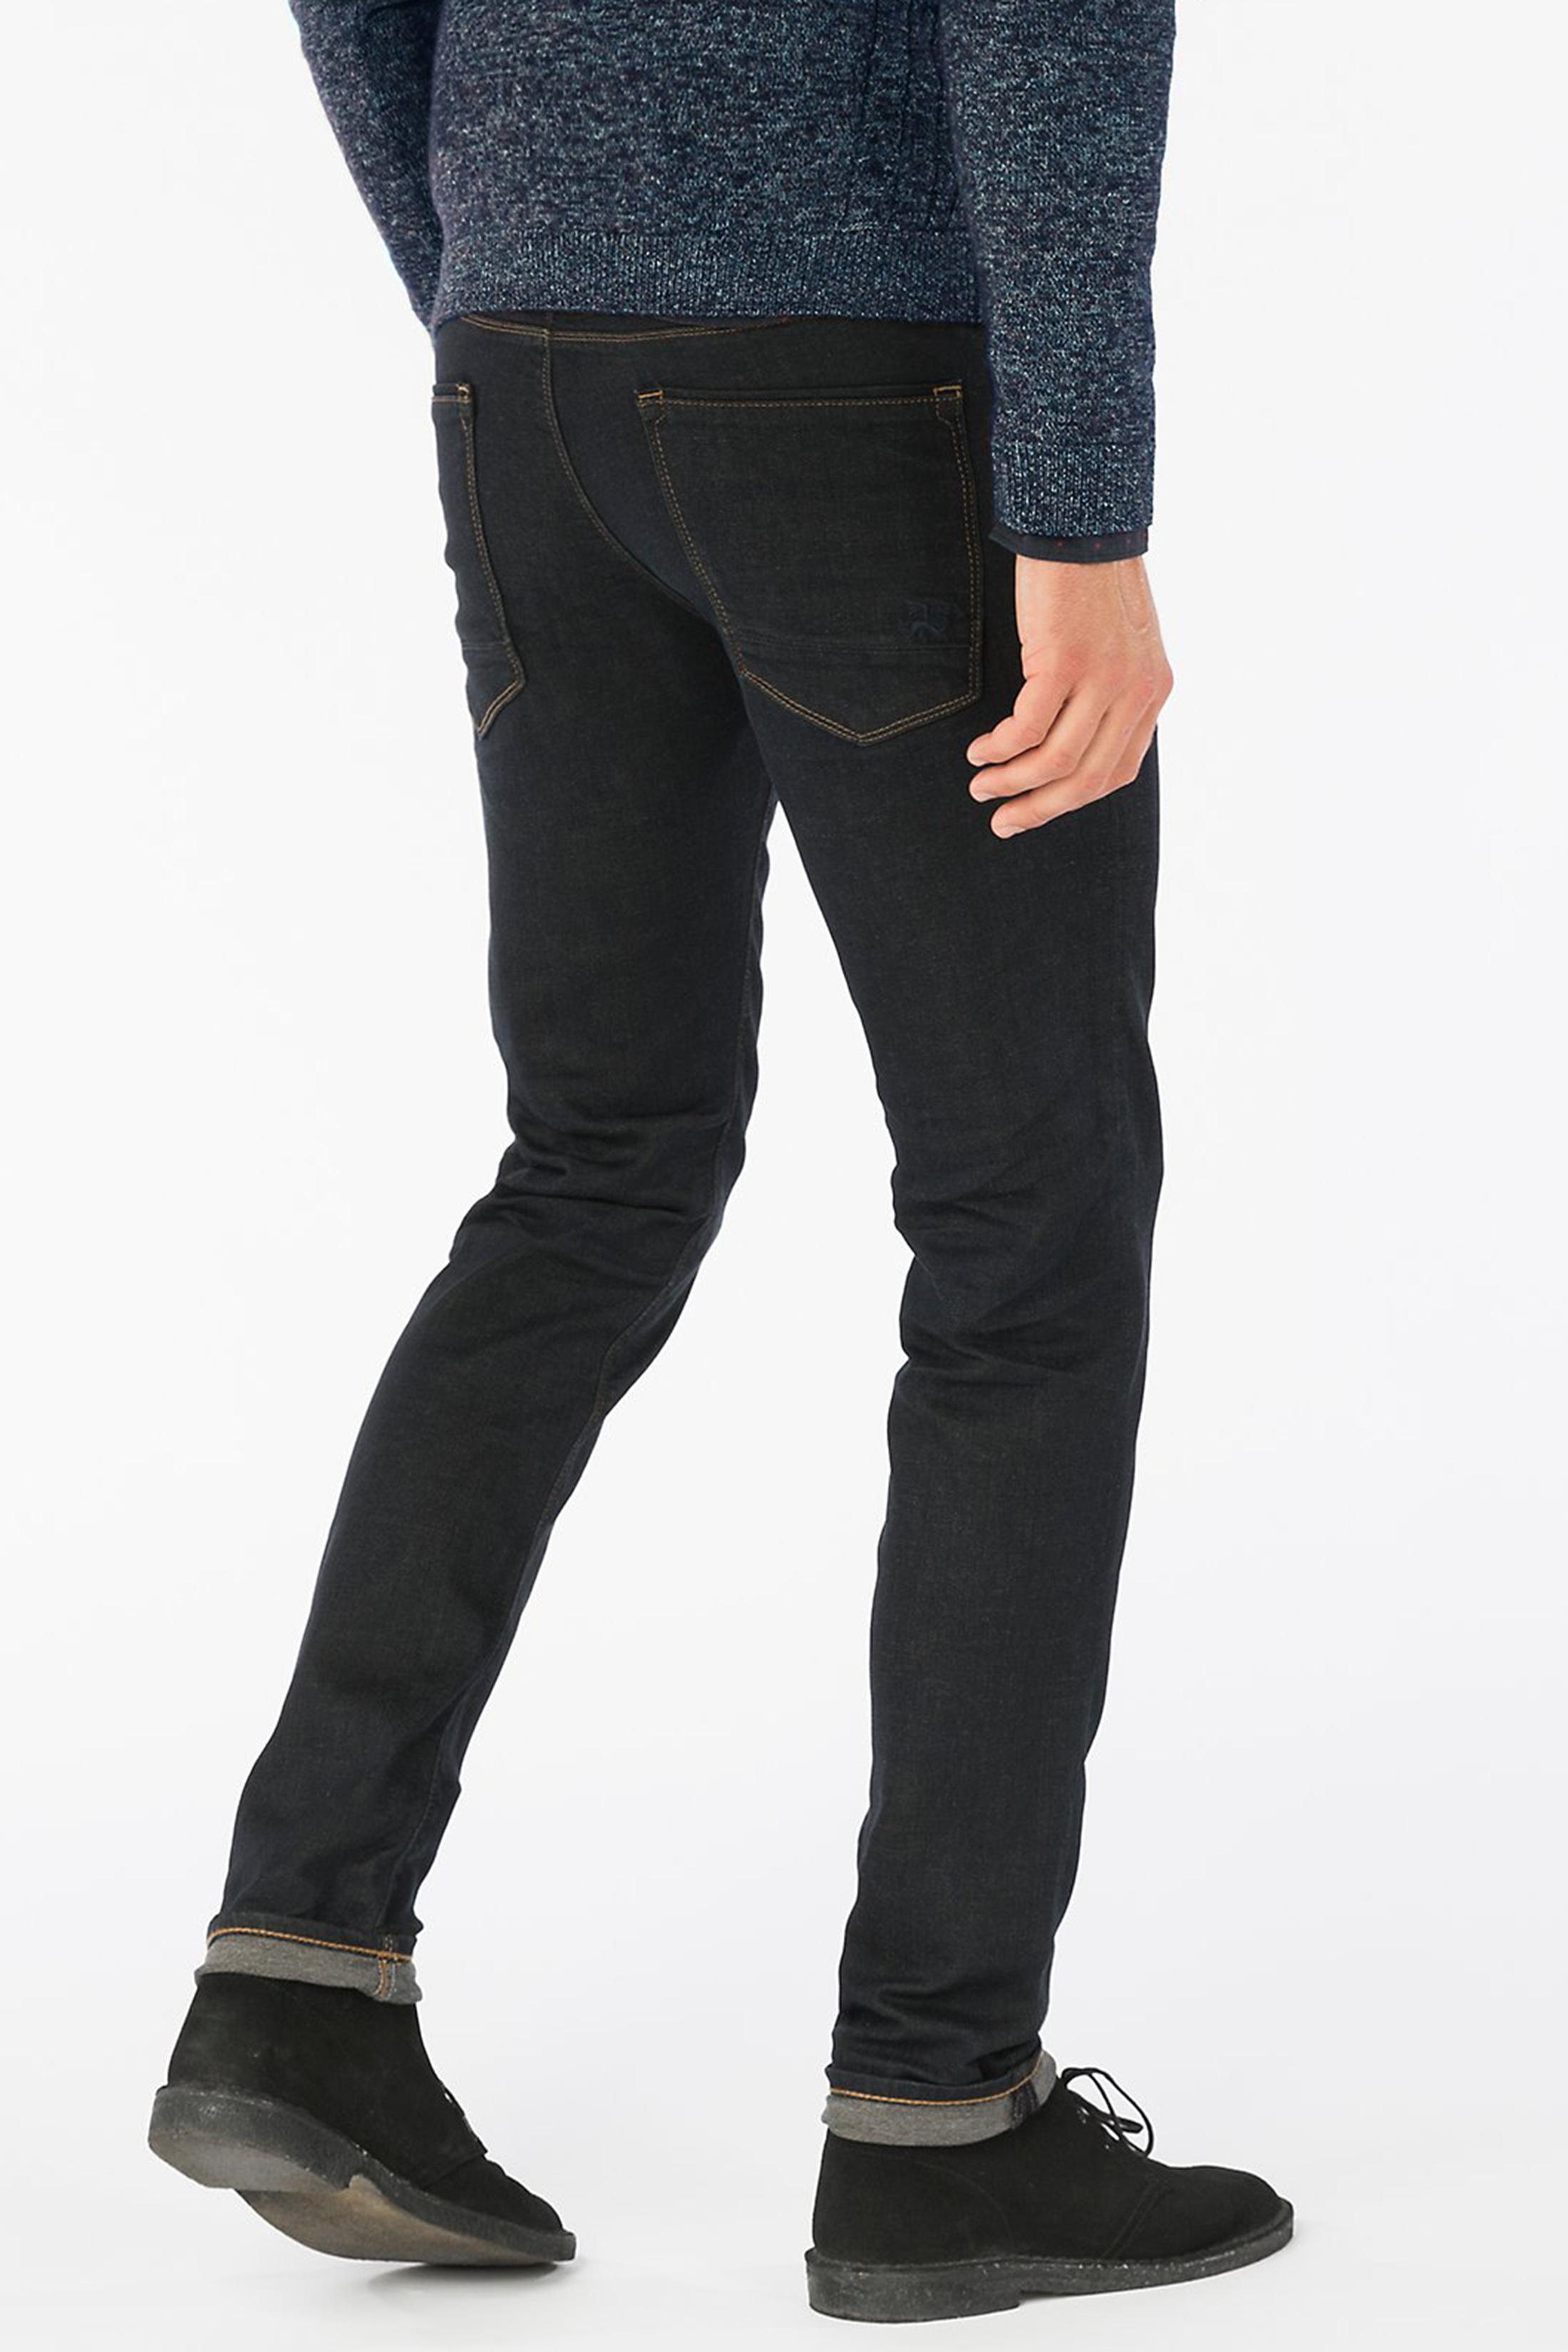 Vanguard V7 Rider Jeans Slim Fit CCR foto 6